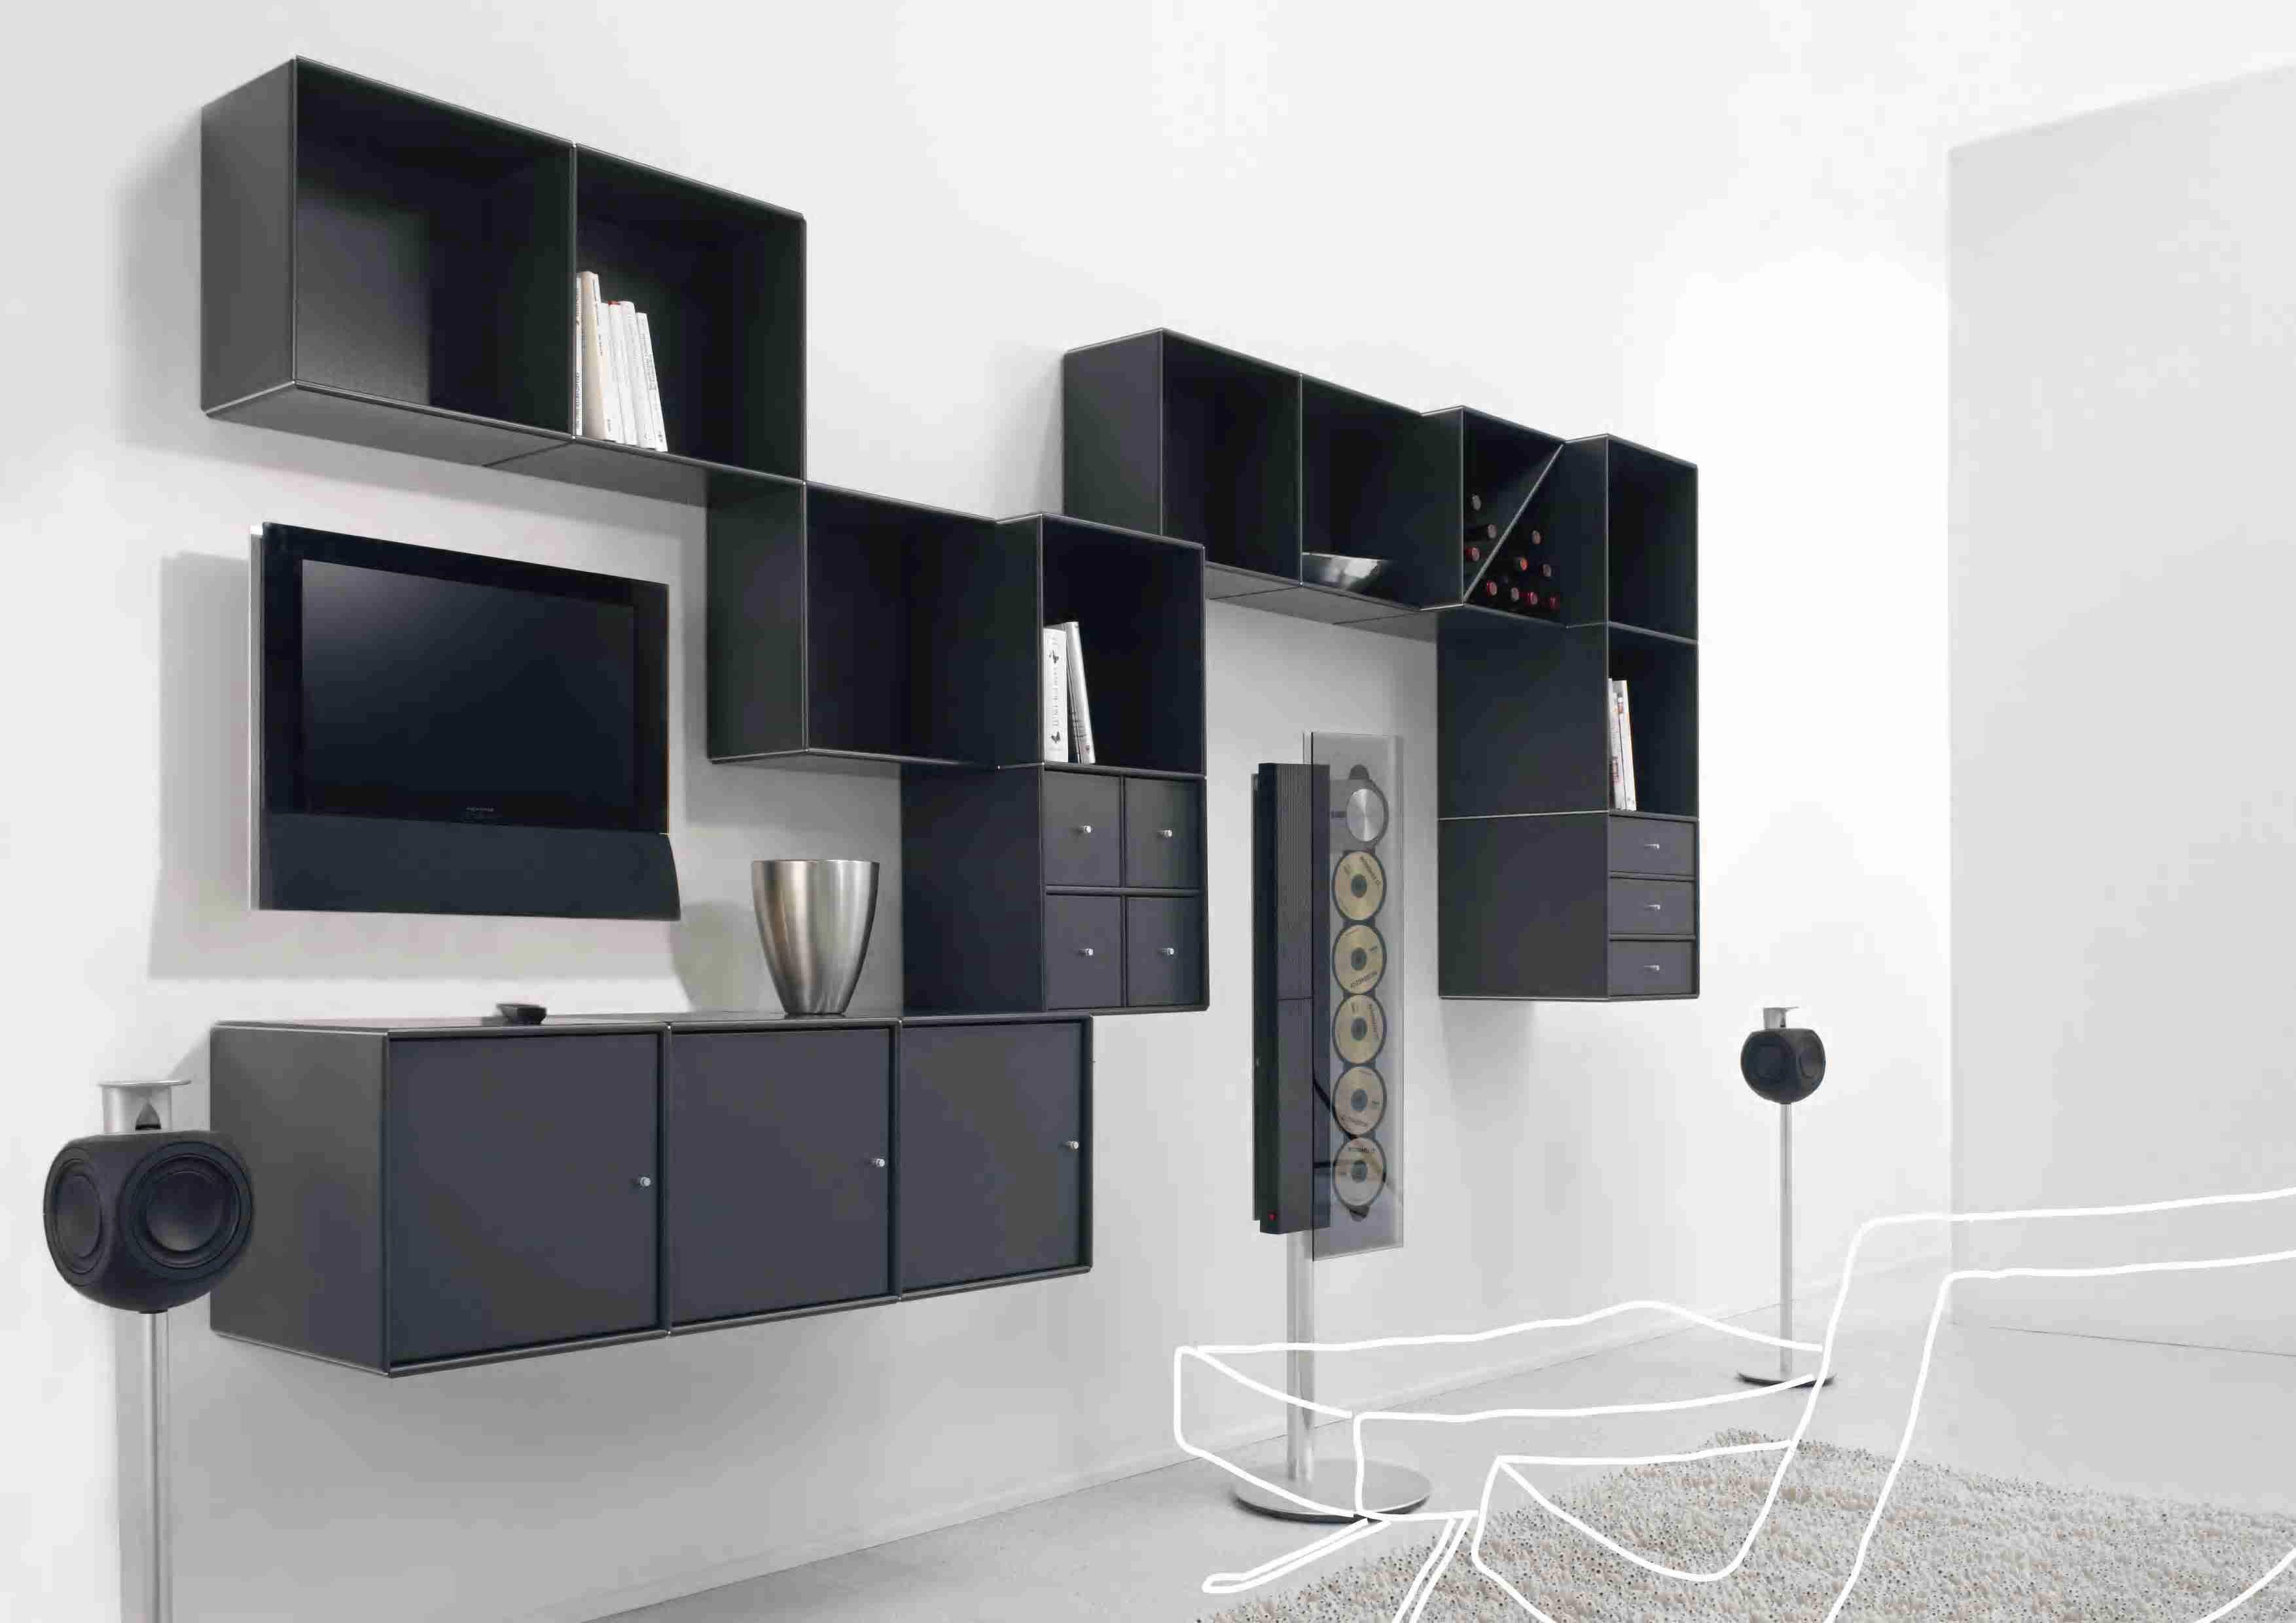 tv wandmeubel Quadrant by ABC-Reoler | Quadrant by ABC Reoler ...